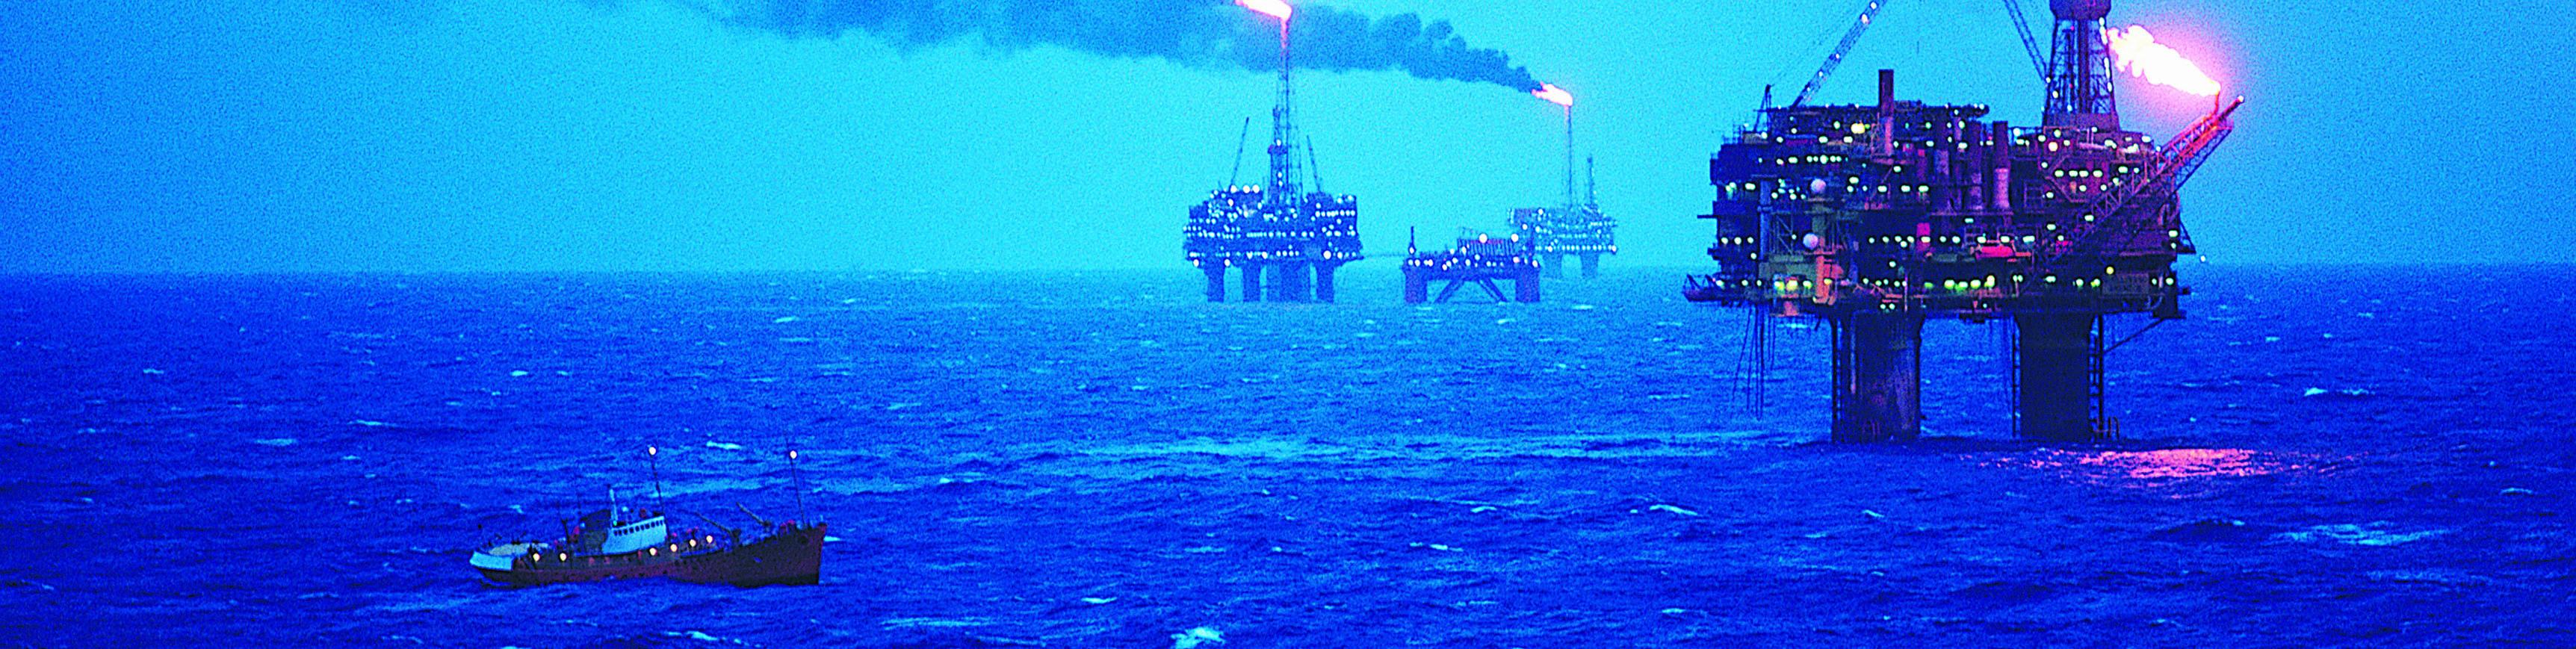 OilPlatformNorthSea